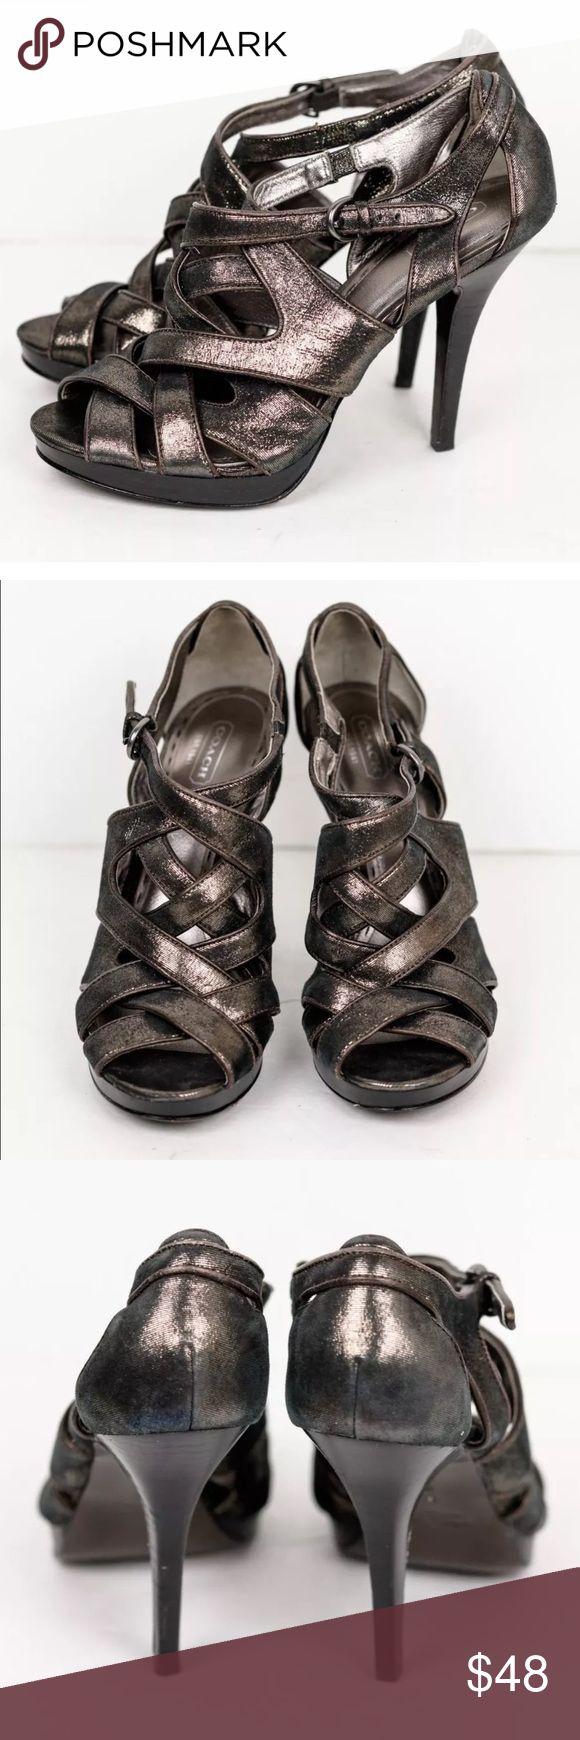 Coach Brown Glitter Metallic Pumps Heels Shoes Coach Women's Brown Glitter Metallic Pumps Leather Heels Pumps Shoes Coach Shoes Heels